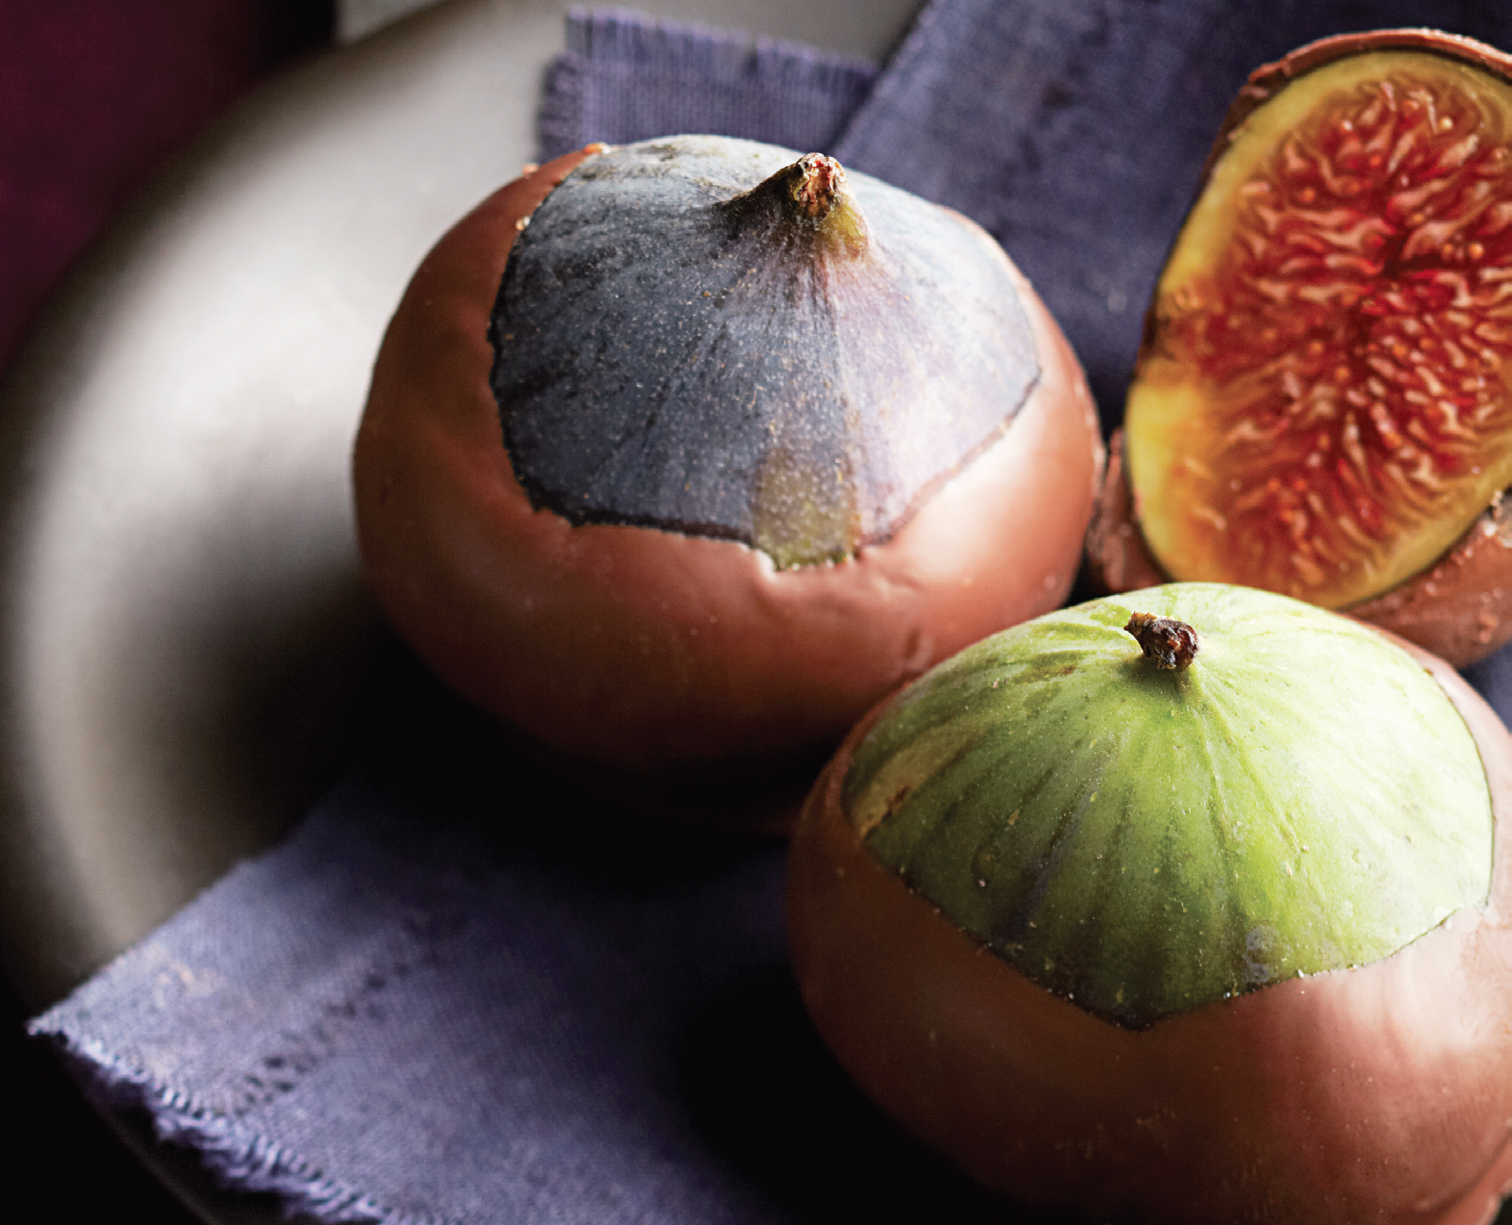 Chocolate-dipped figs, Feb 13, p78